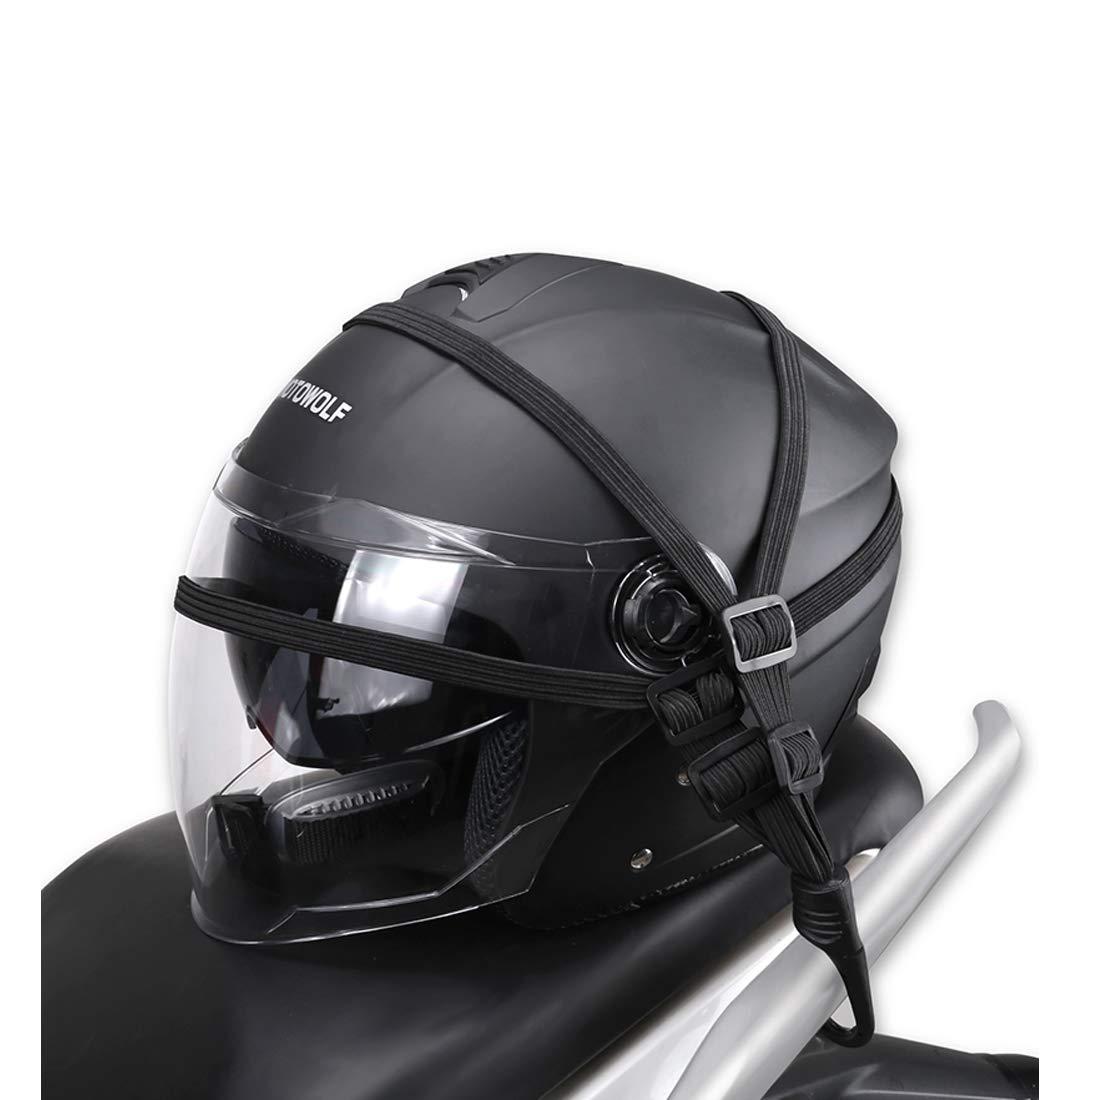 kemimoto Motorcycle Helmet Luggage Flat Strap Bungee Cords Helmet Sack Riding Bicycle Sports